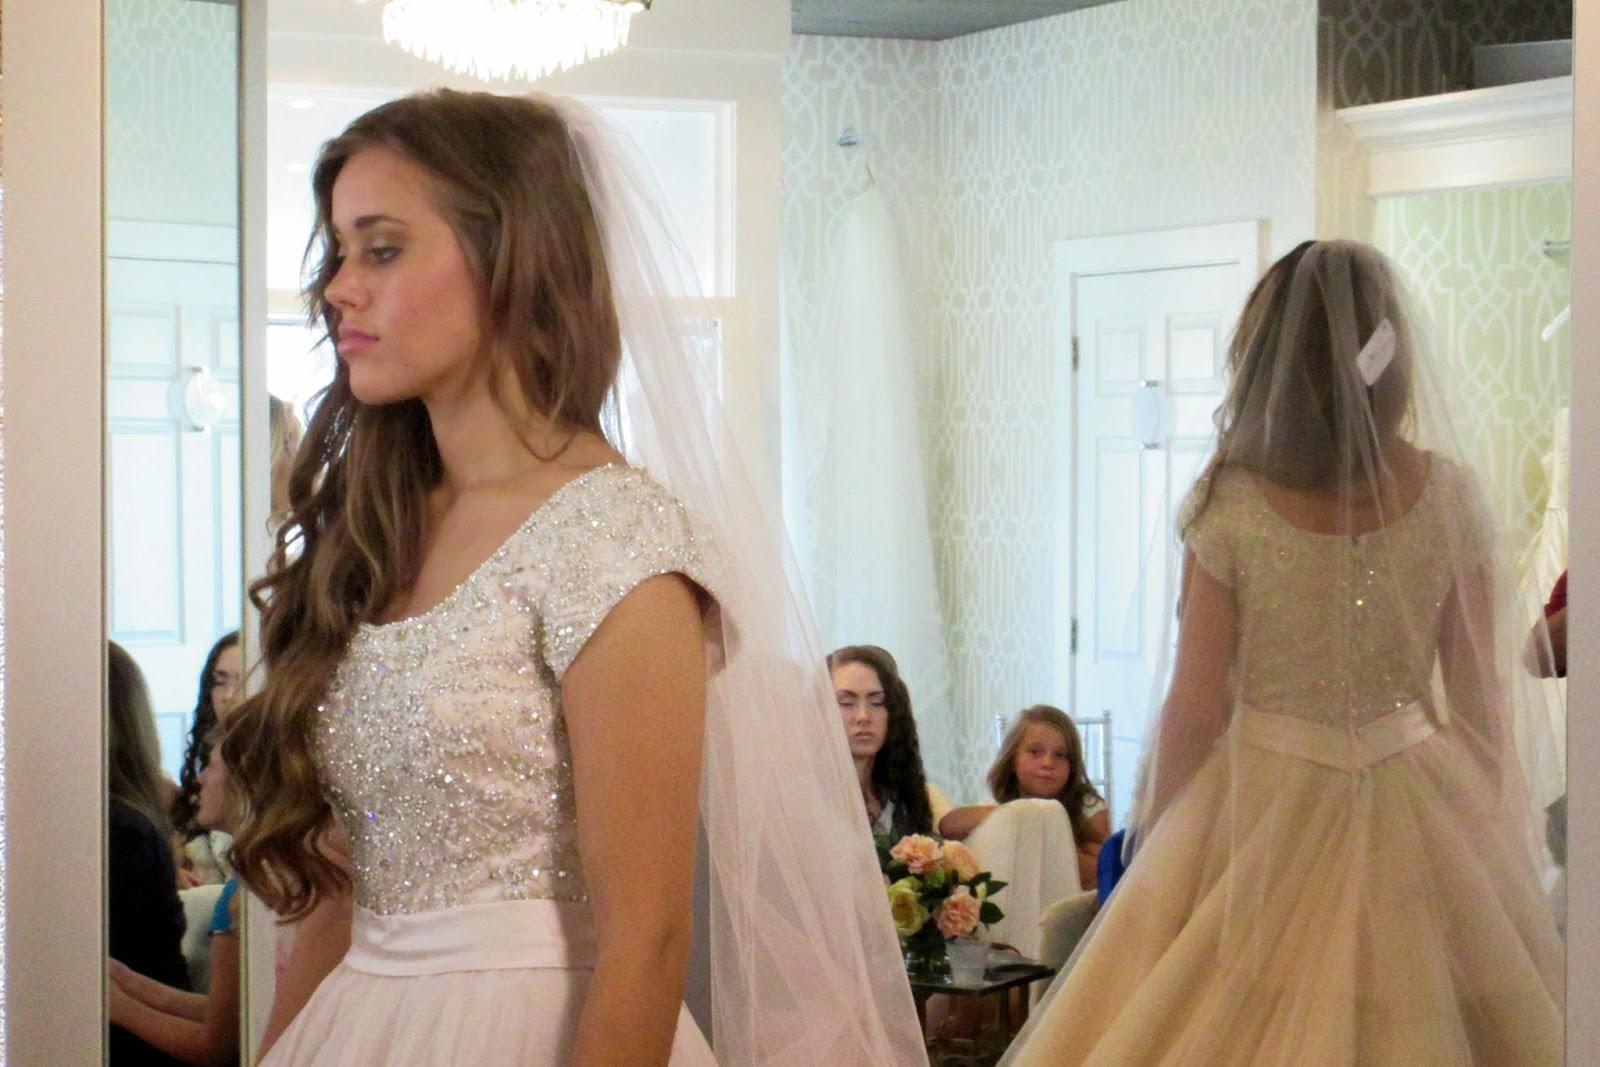 Wedding Dress Shopping 81 Stunning Email ThisBlogThis